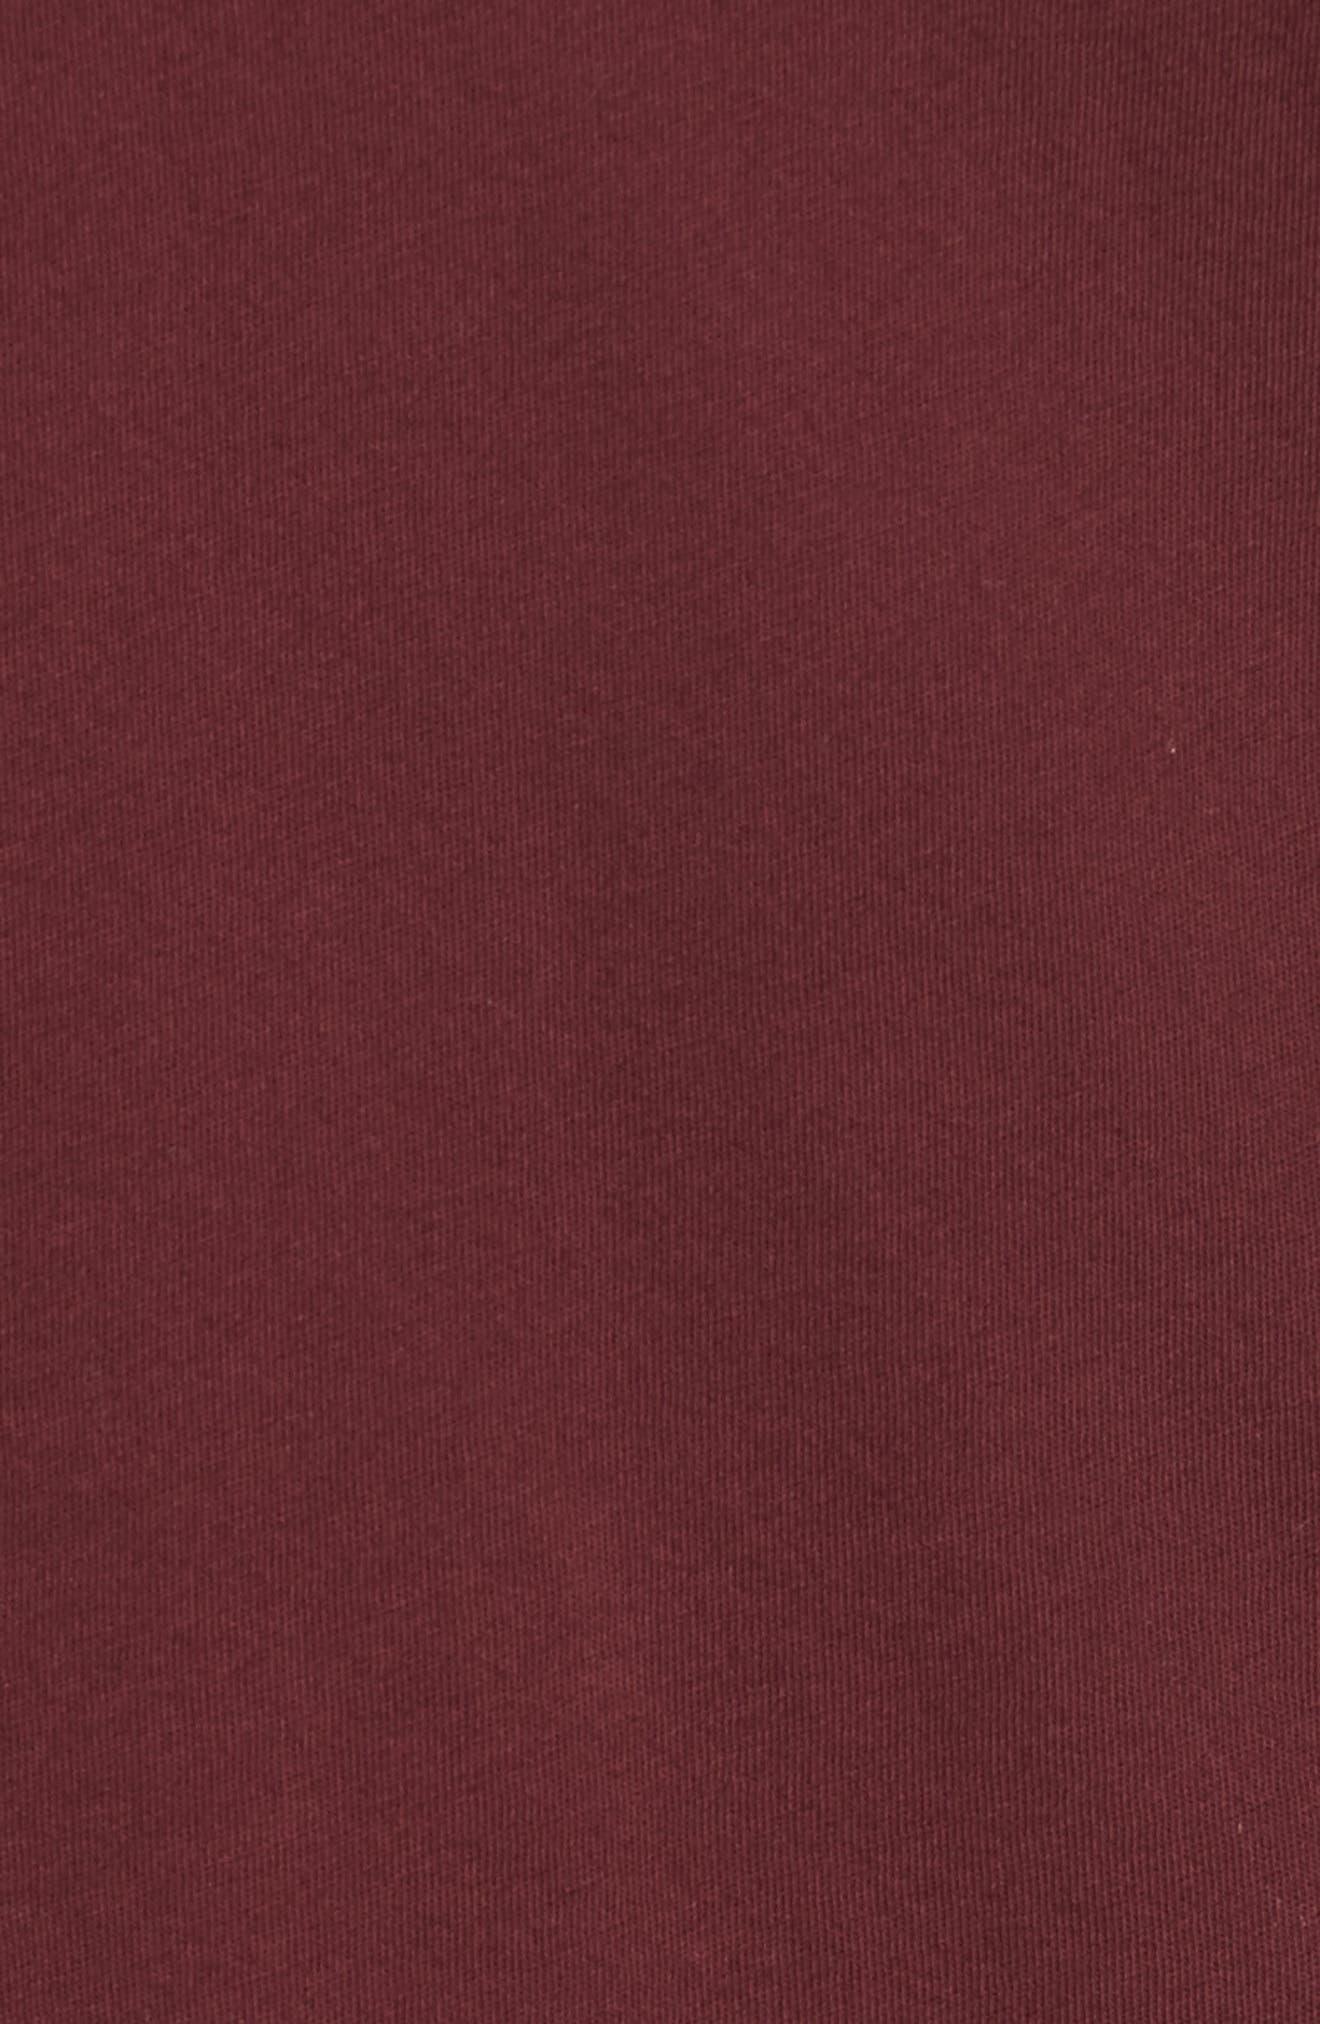 Henson Tee,                             Alternate thumbnail 167, color,